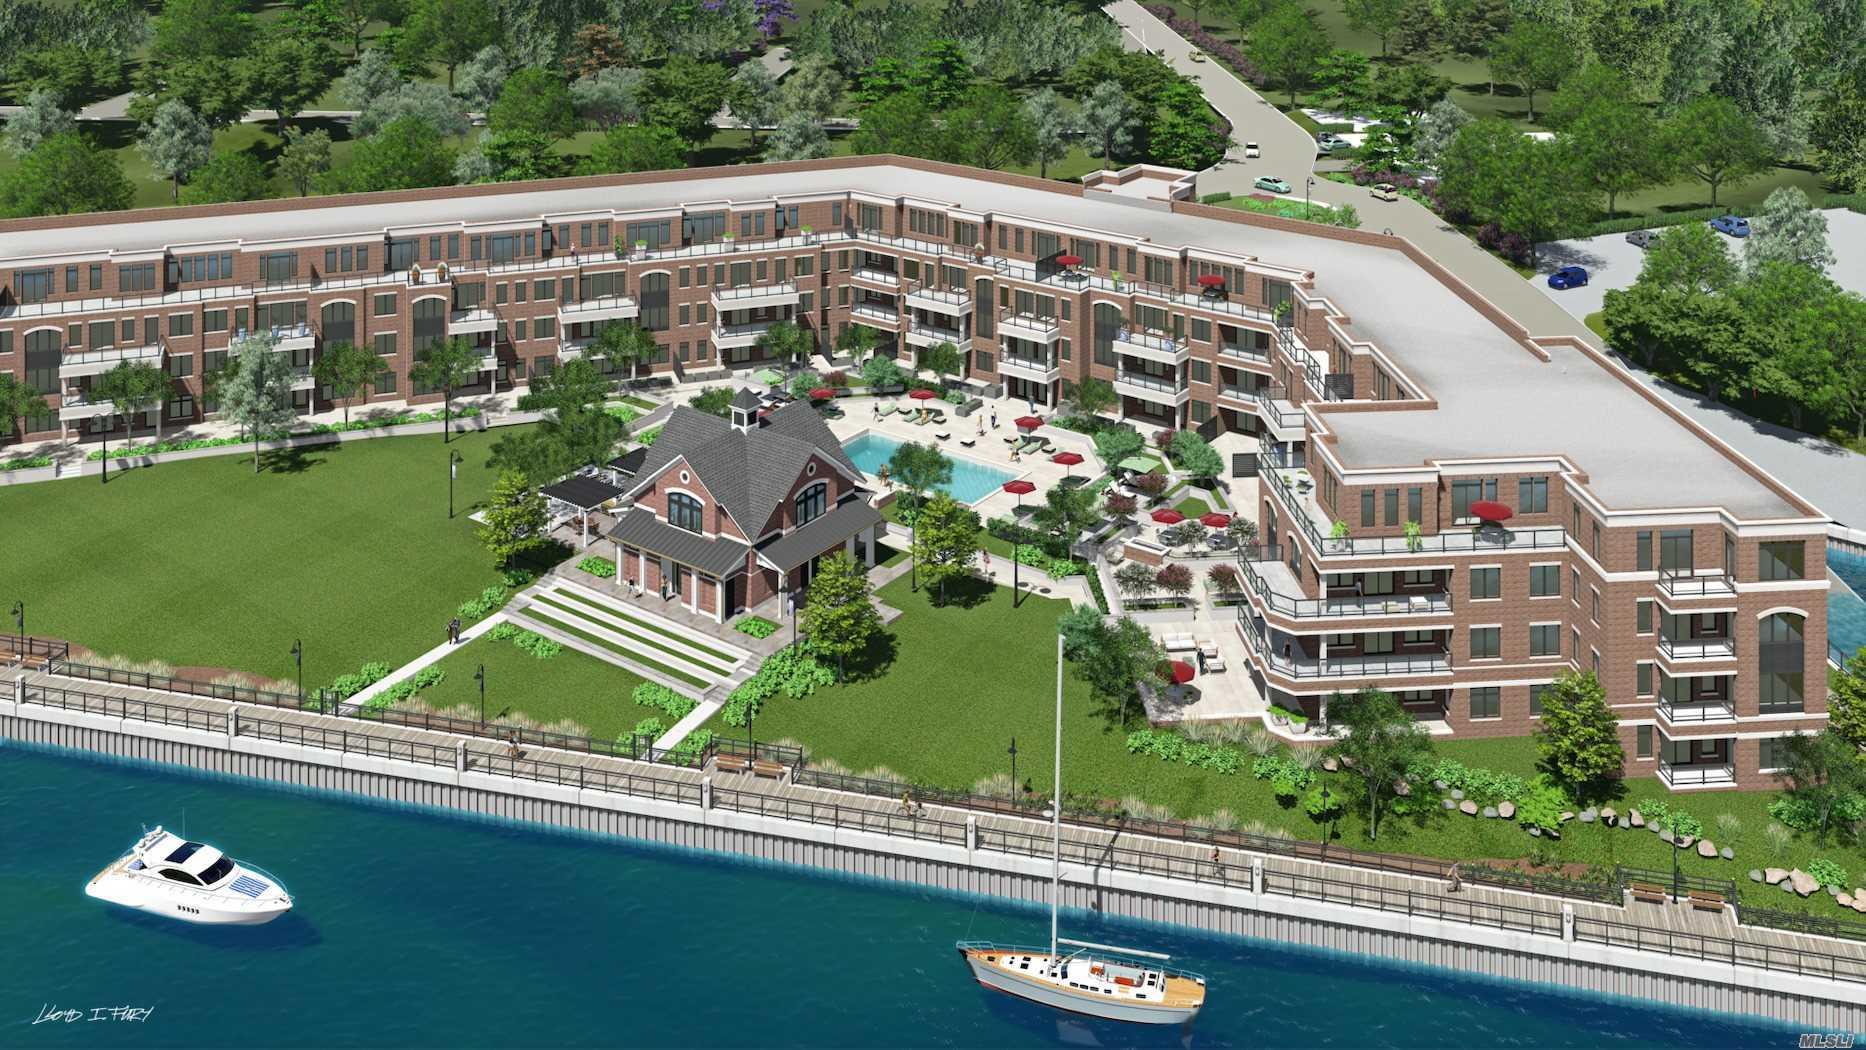 Property for sale at 10 Shore Road # 100, Glenwood Landing NY 11547, Glenwood Landing,  New York 11547